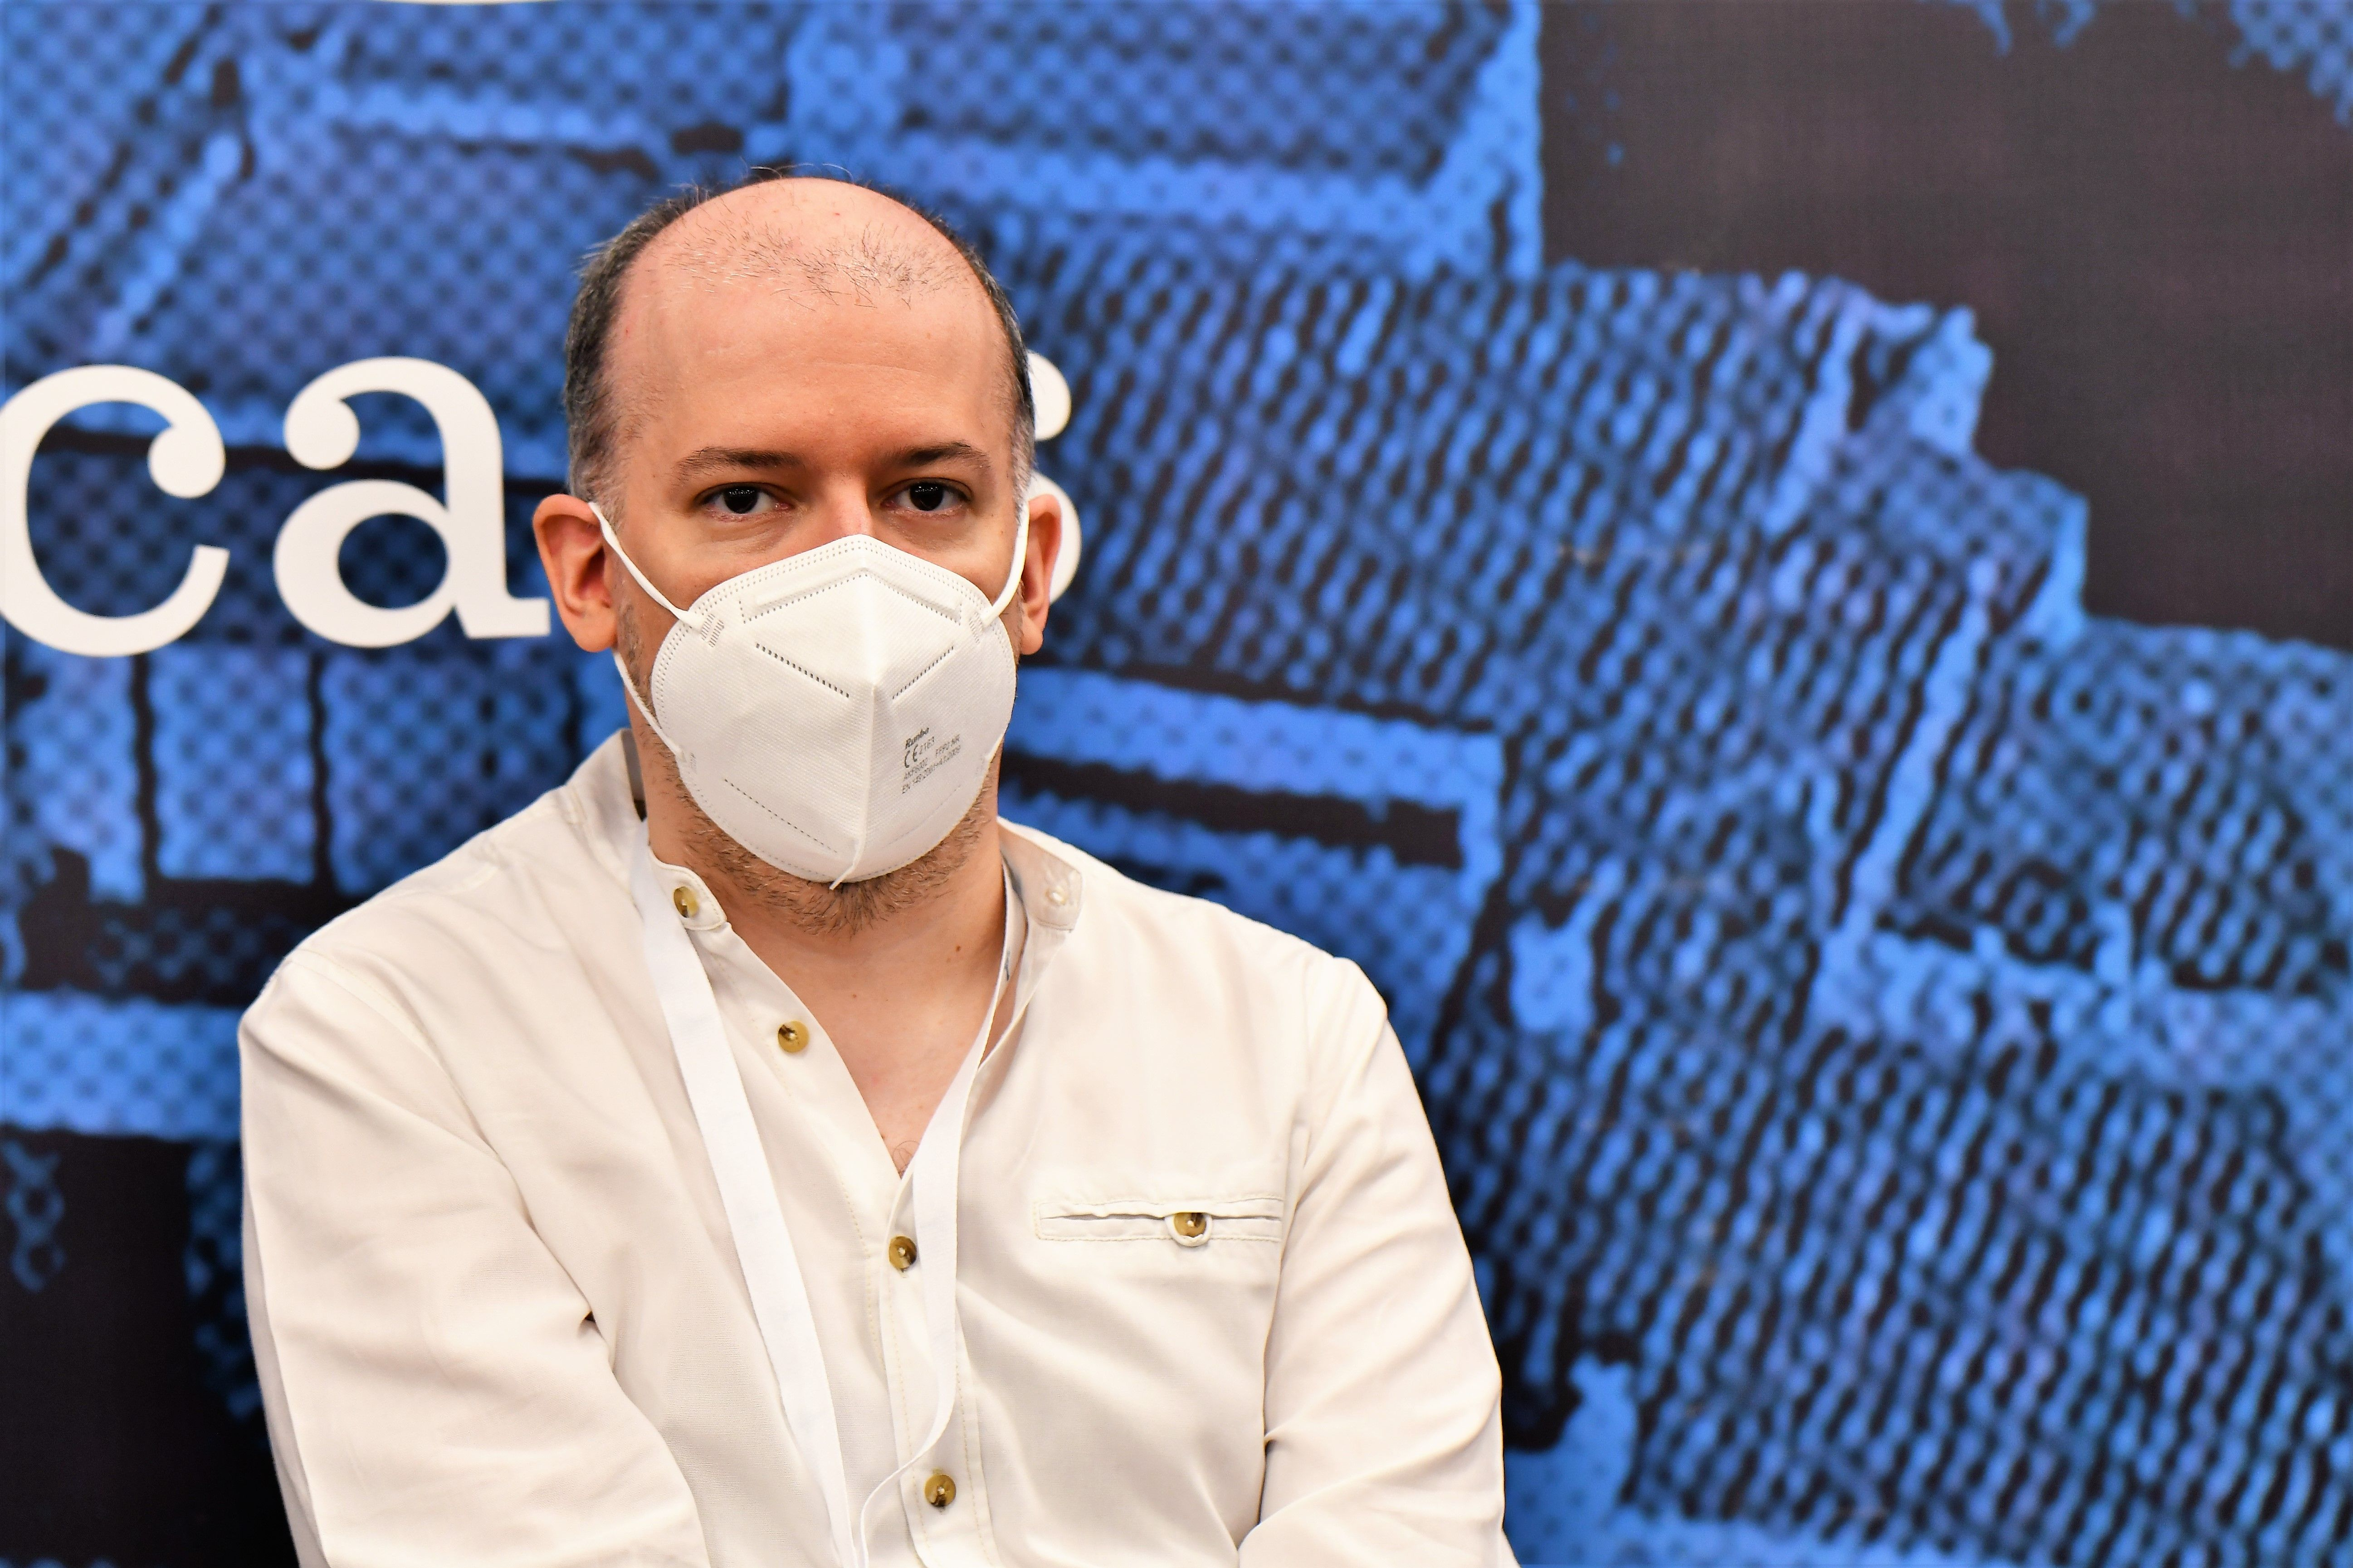 IM David Martinez, coach of the Spanish team at the Women's Chess Olympiad